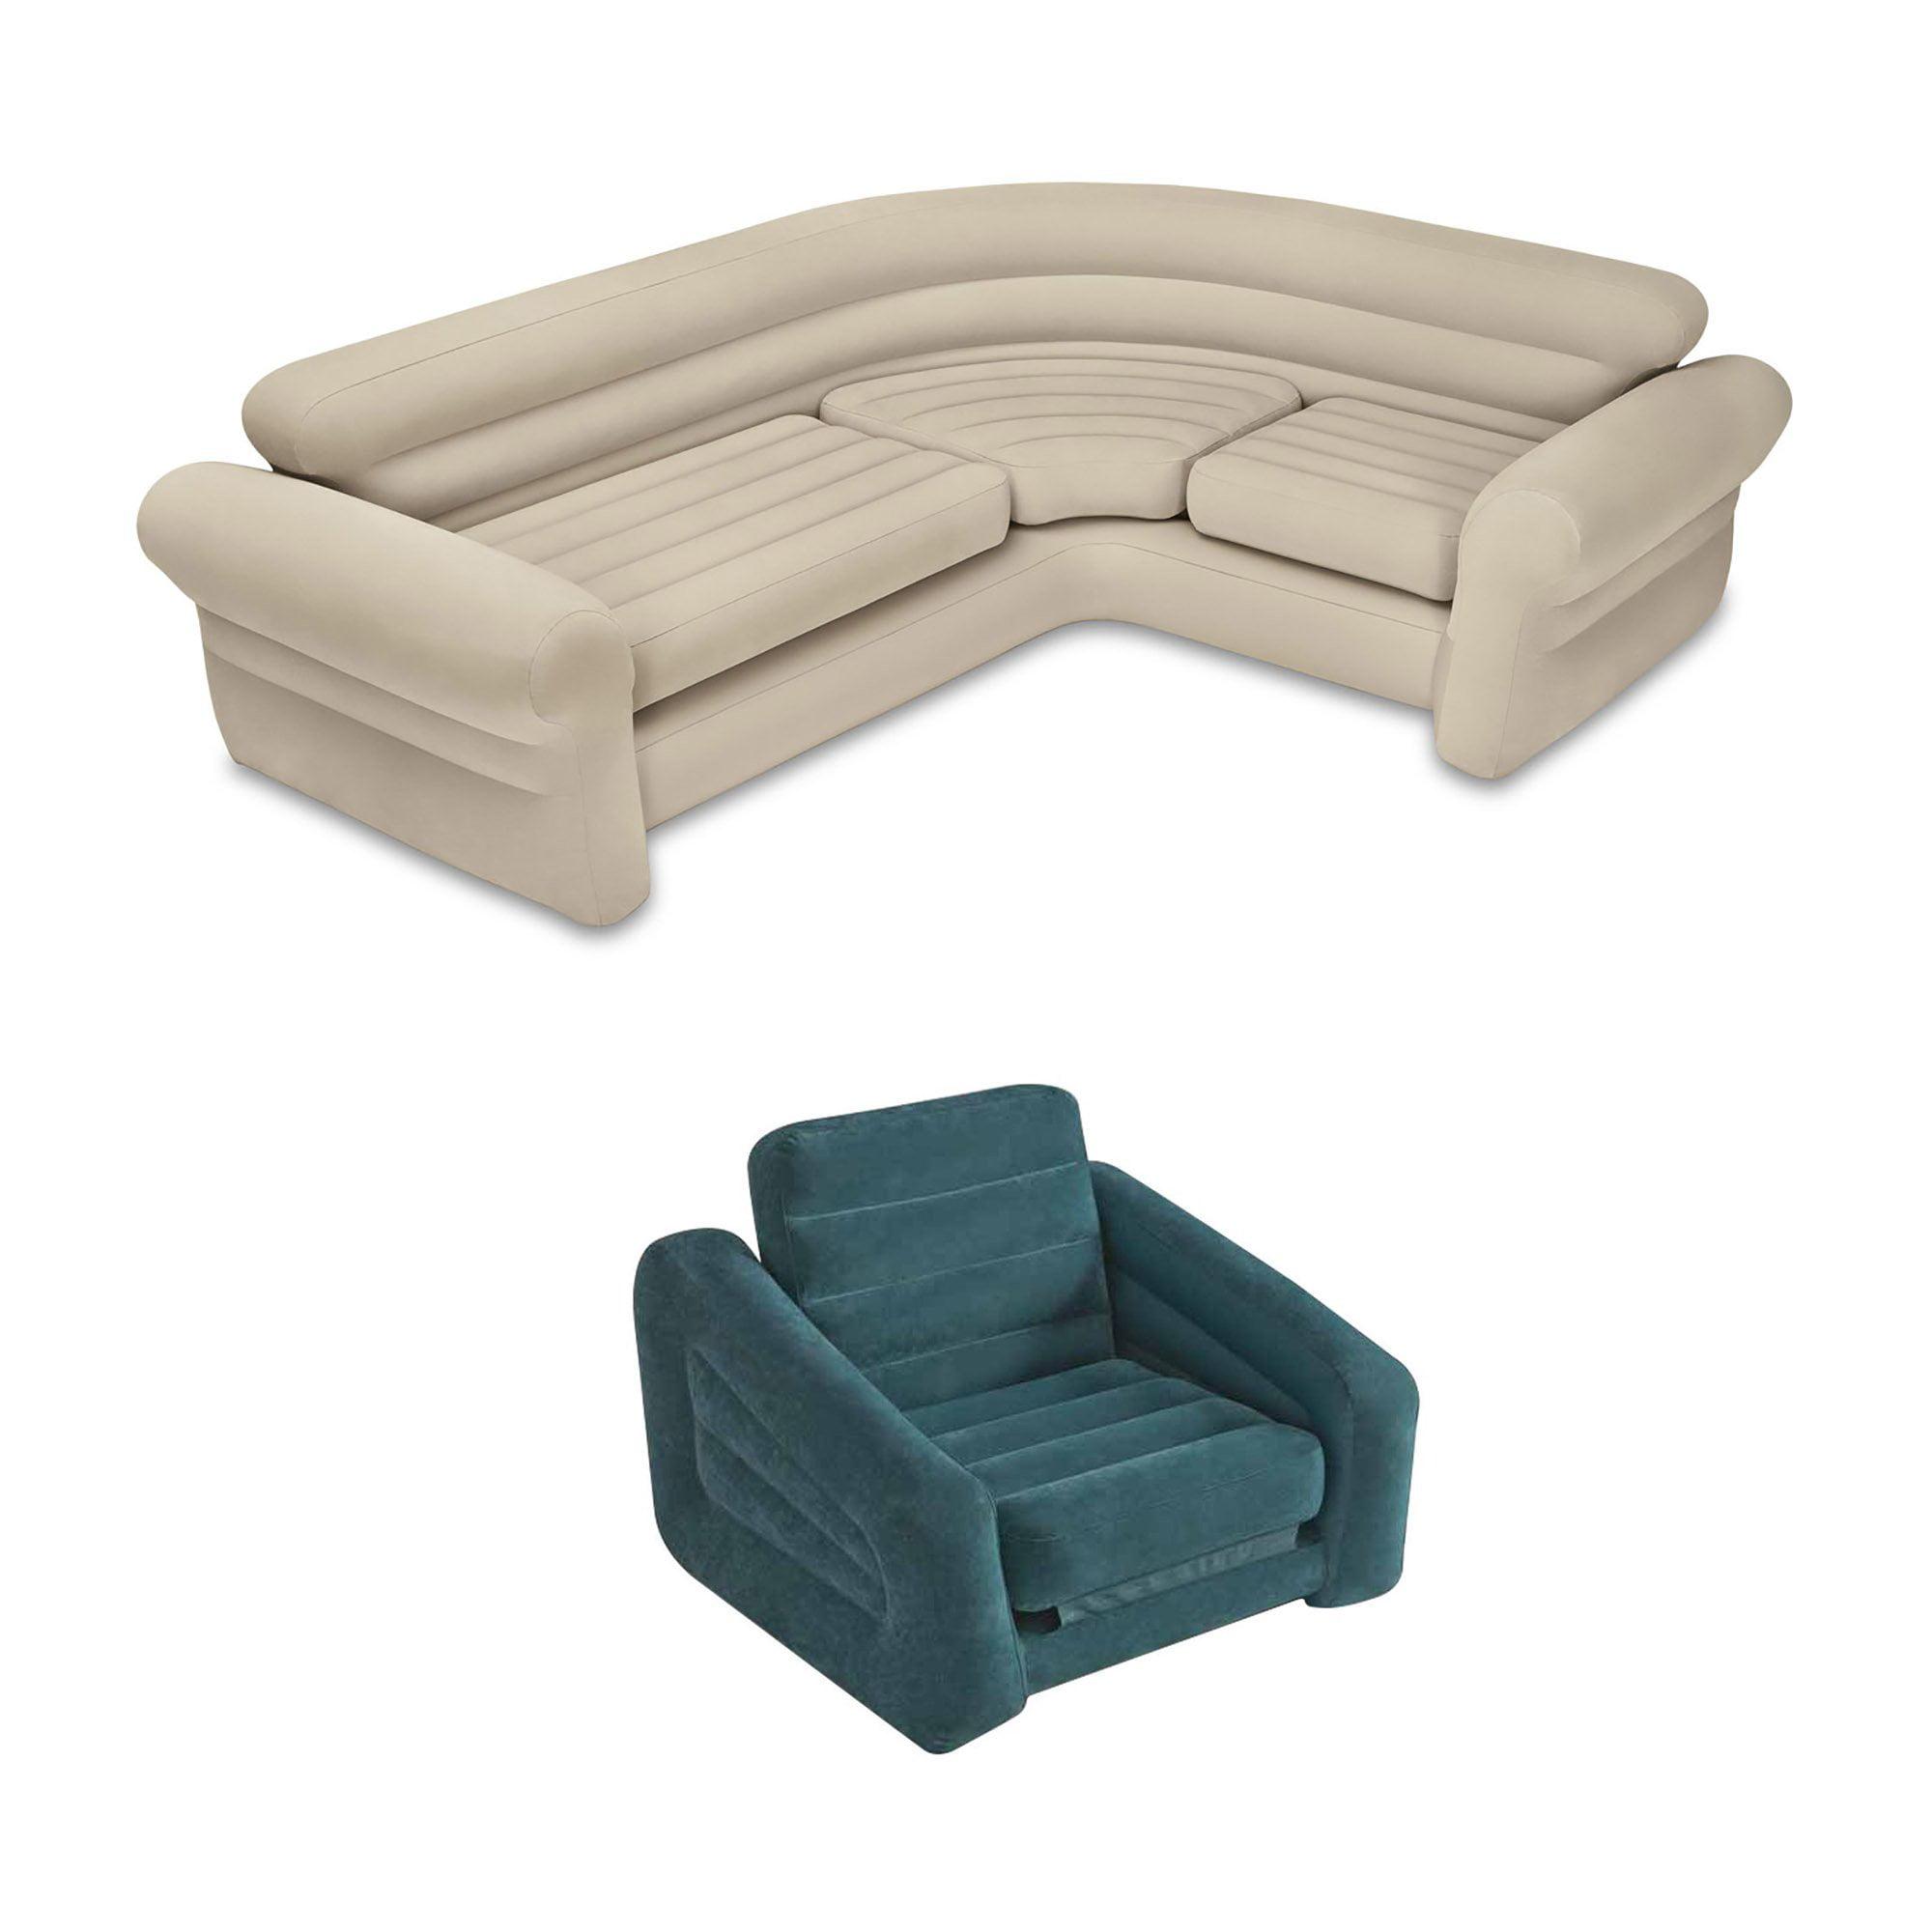 Bon Intex Inflatable Corner Sectional Sofa U0026 Inflatable Air Mattress Pull Out  Chair